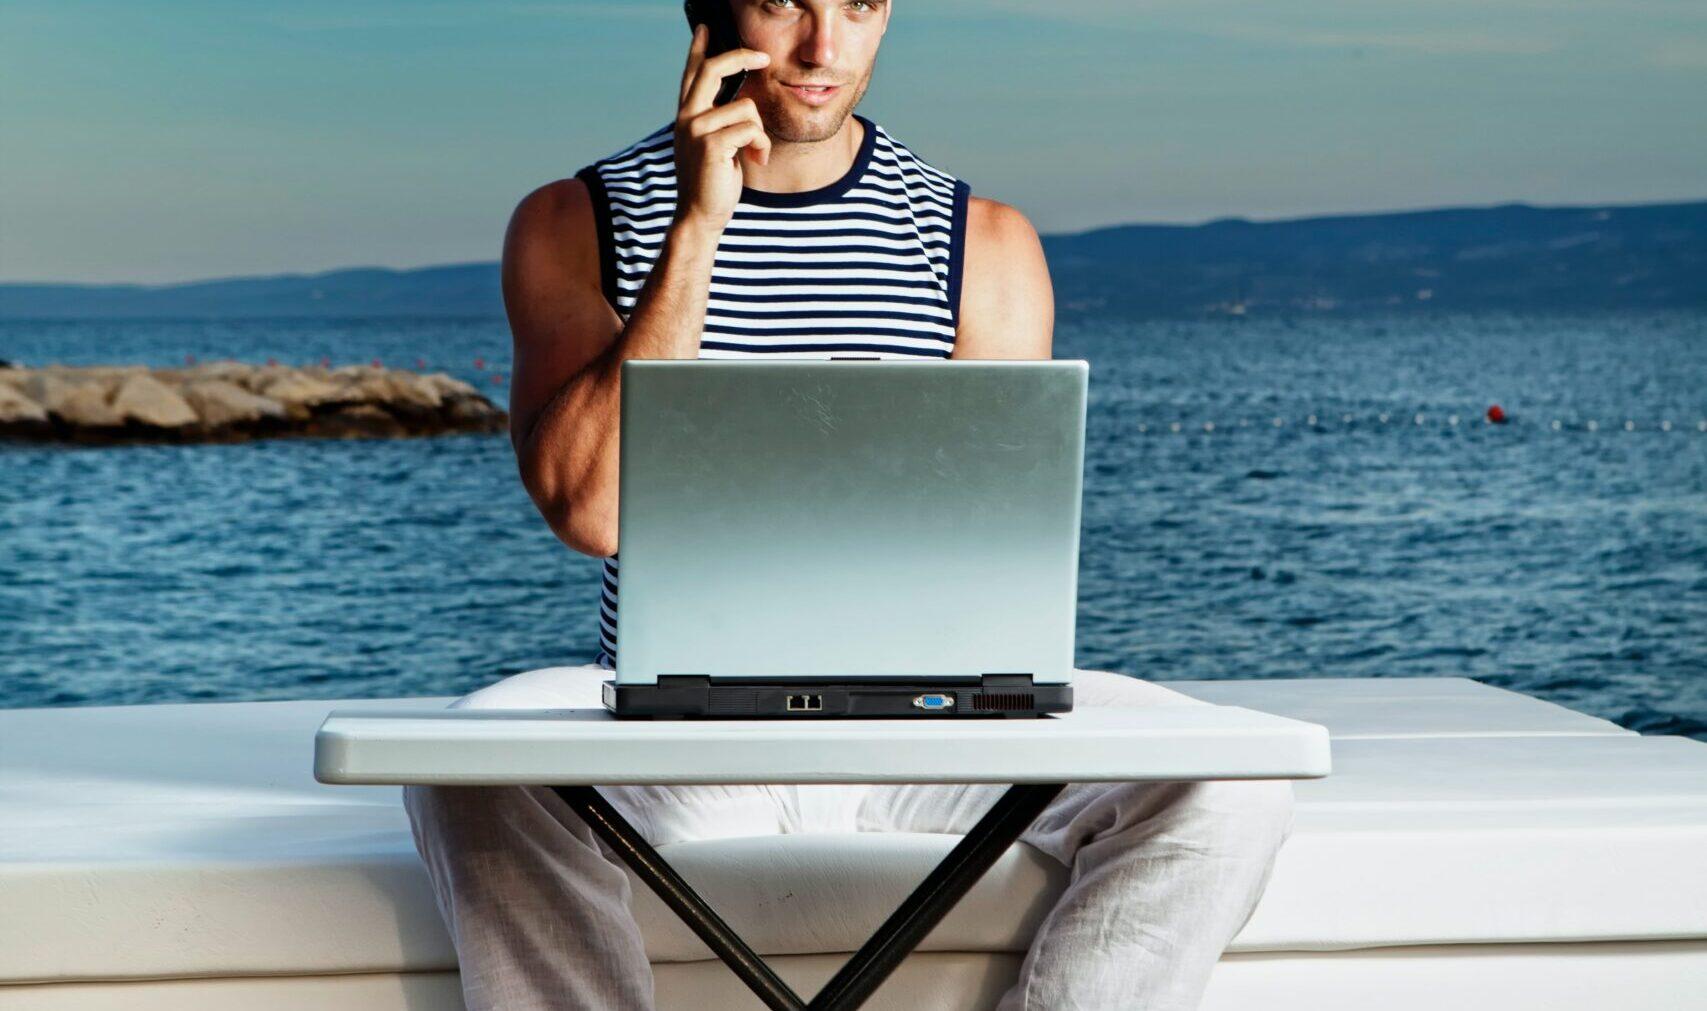 Working remotely : The Digital Nomad Visa